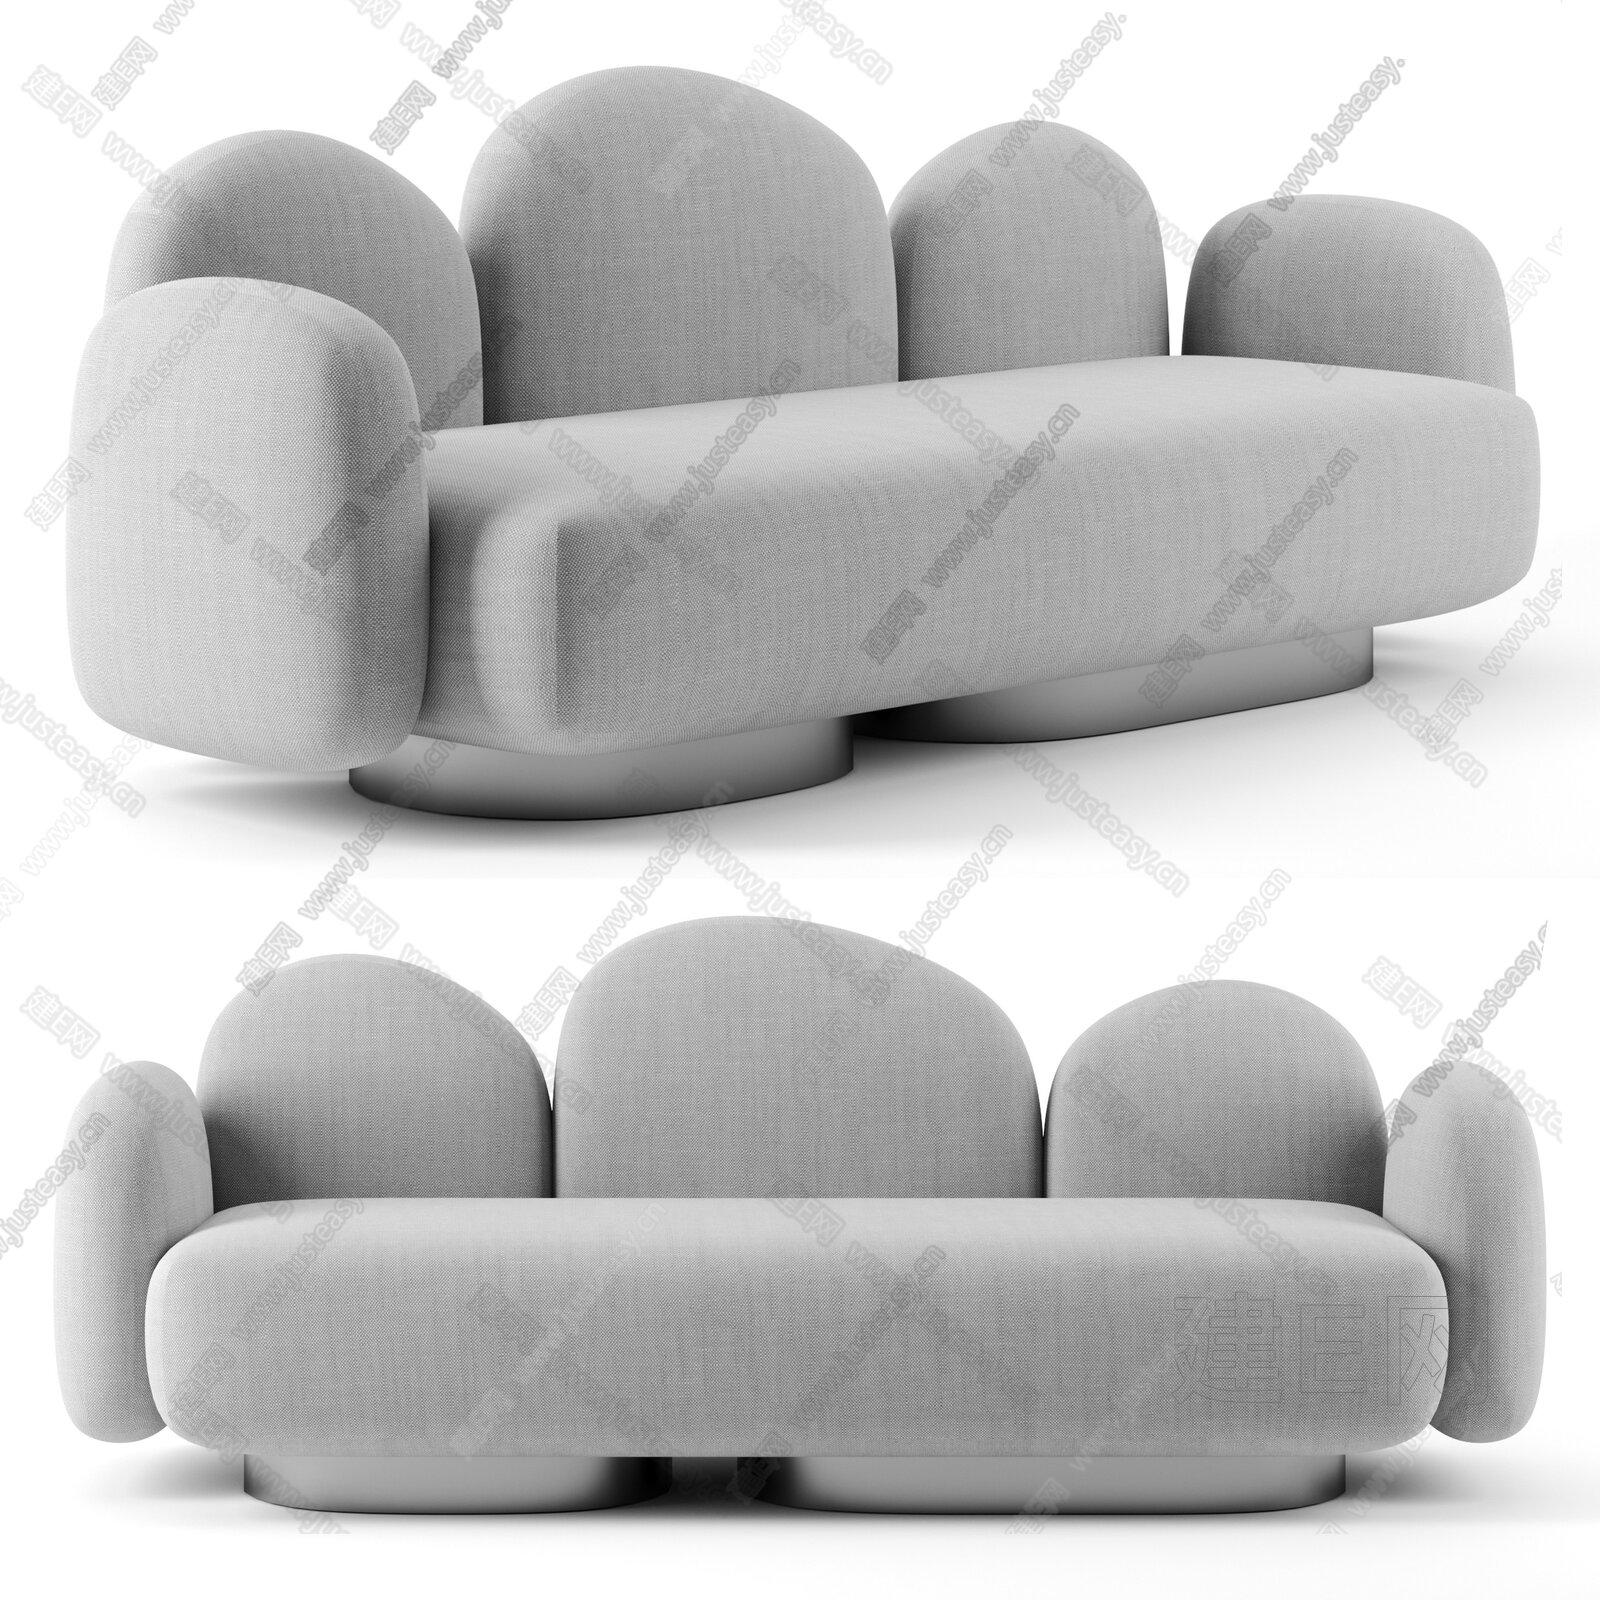 B&B Italia 现代多人沙发3d模型